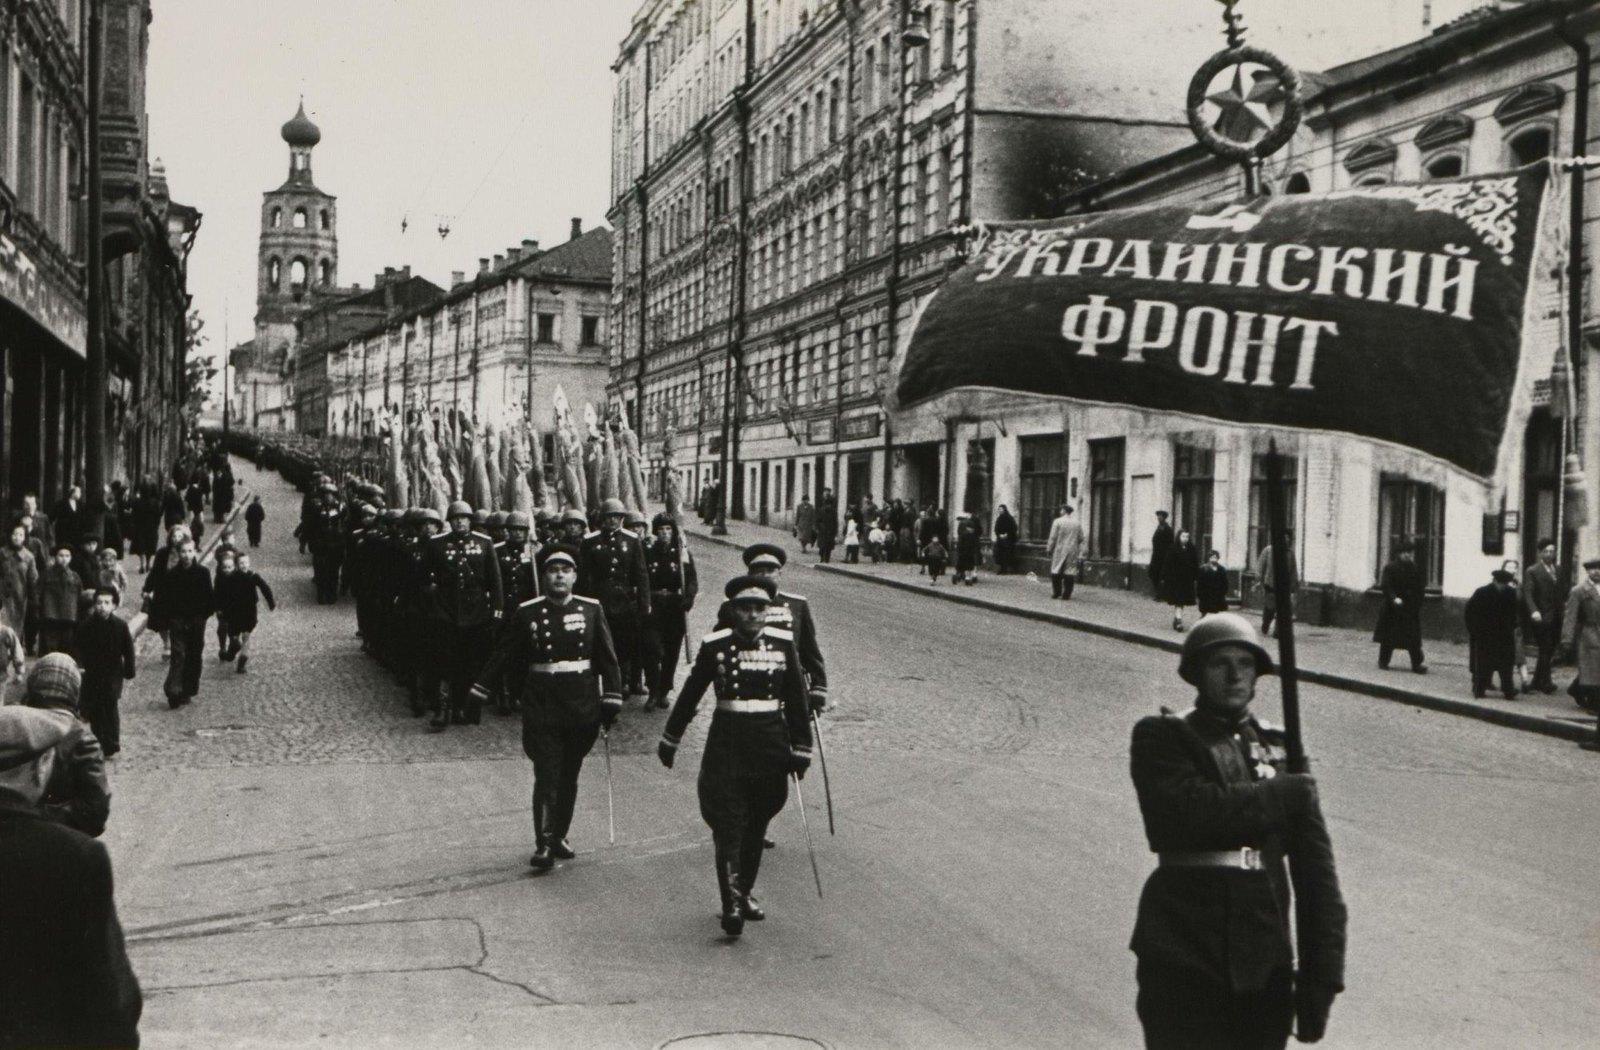 03. Парад частей 4-го Украинского фронта